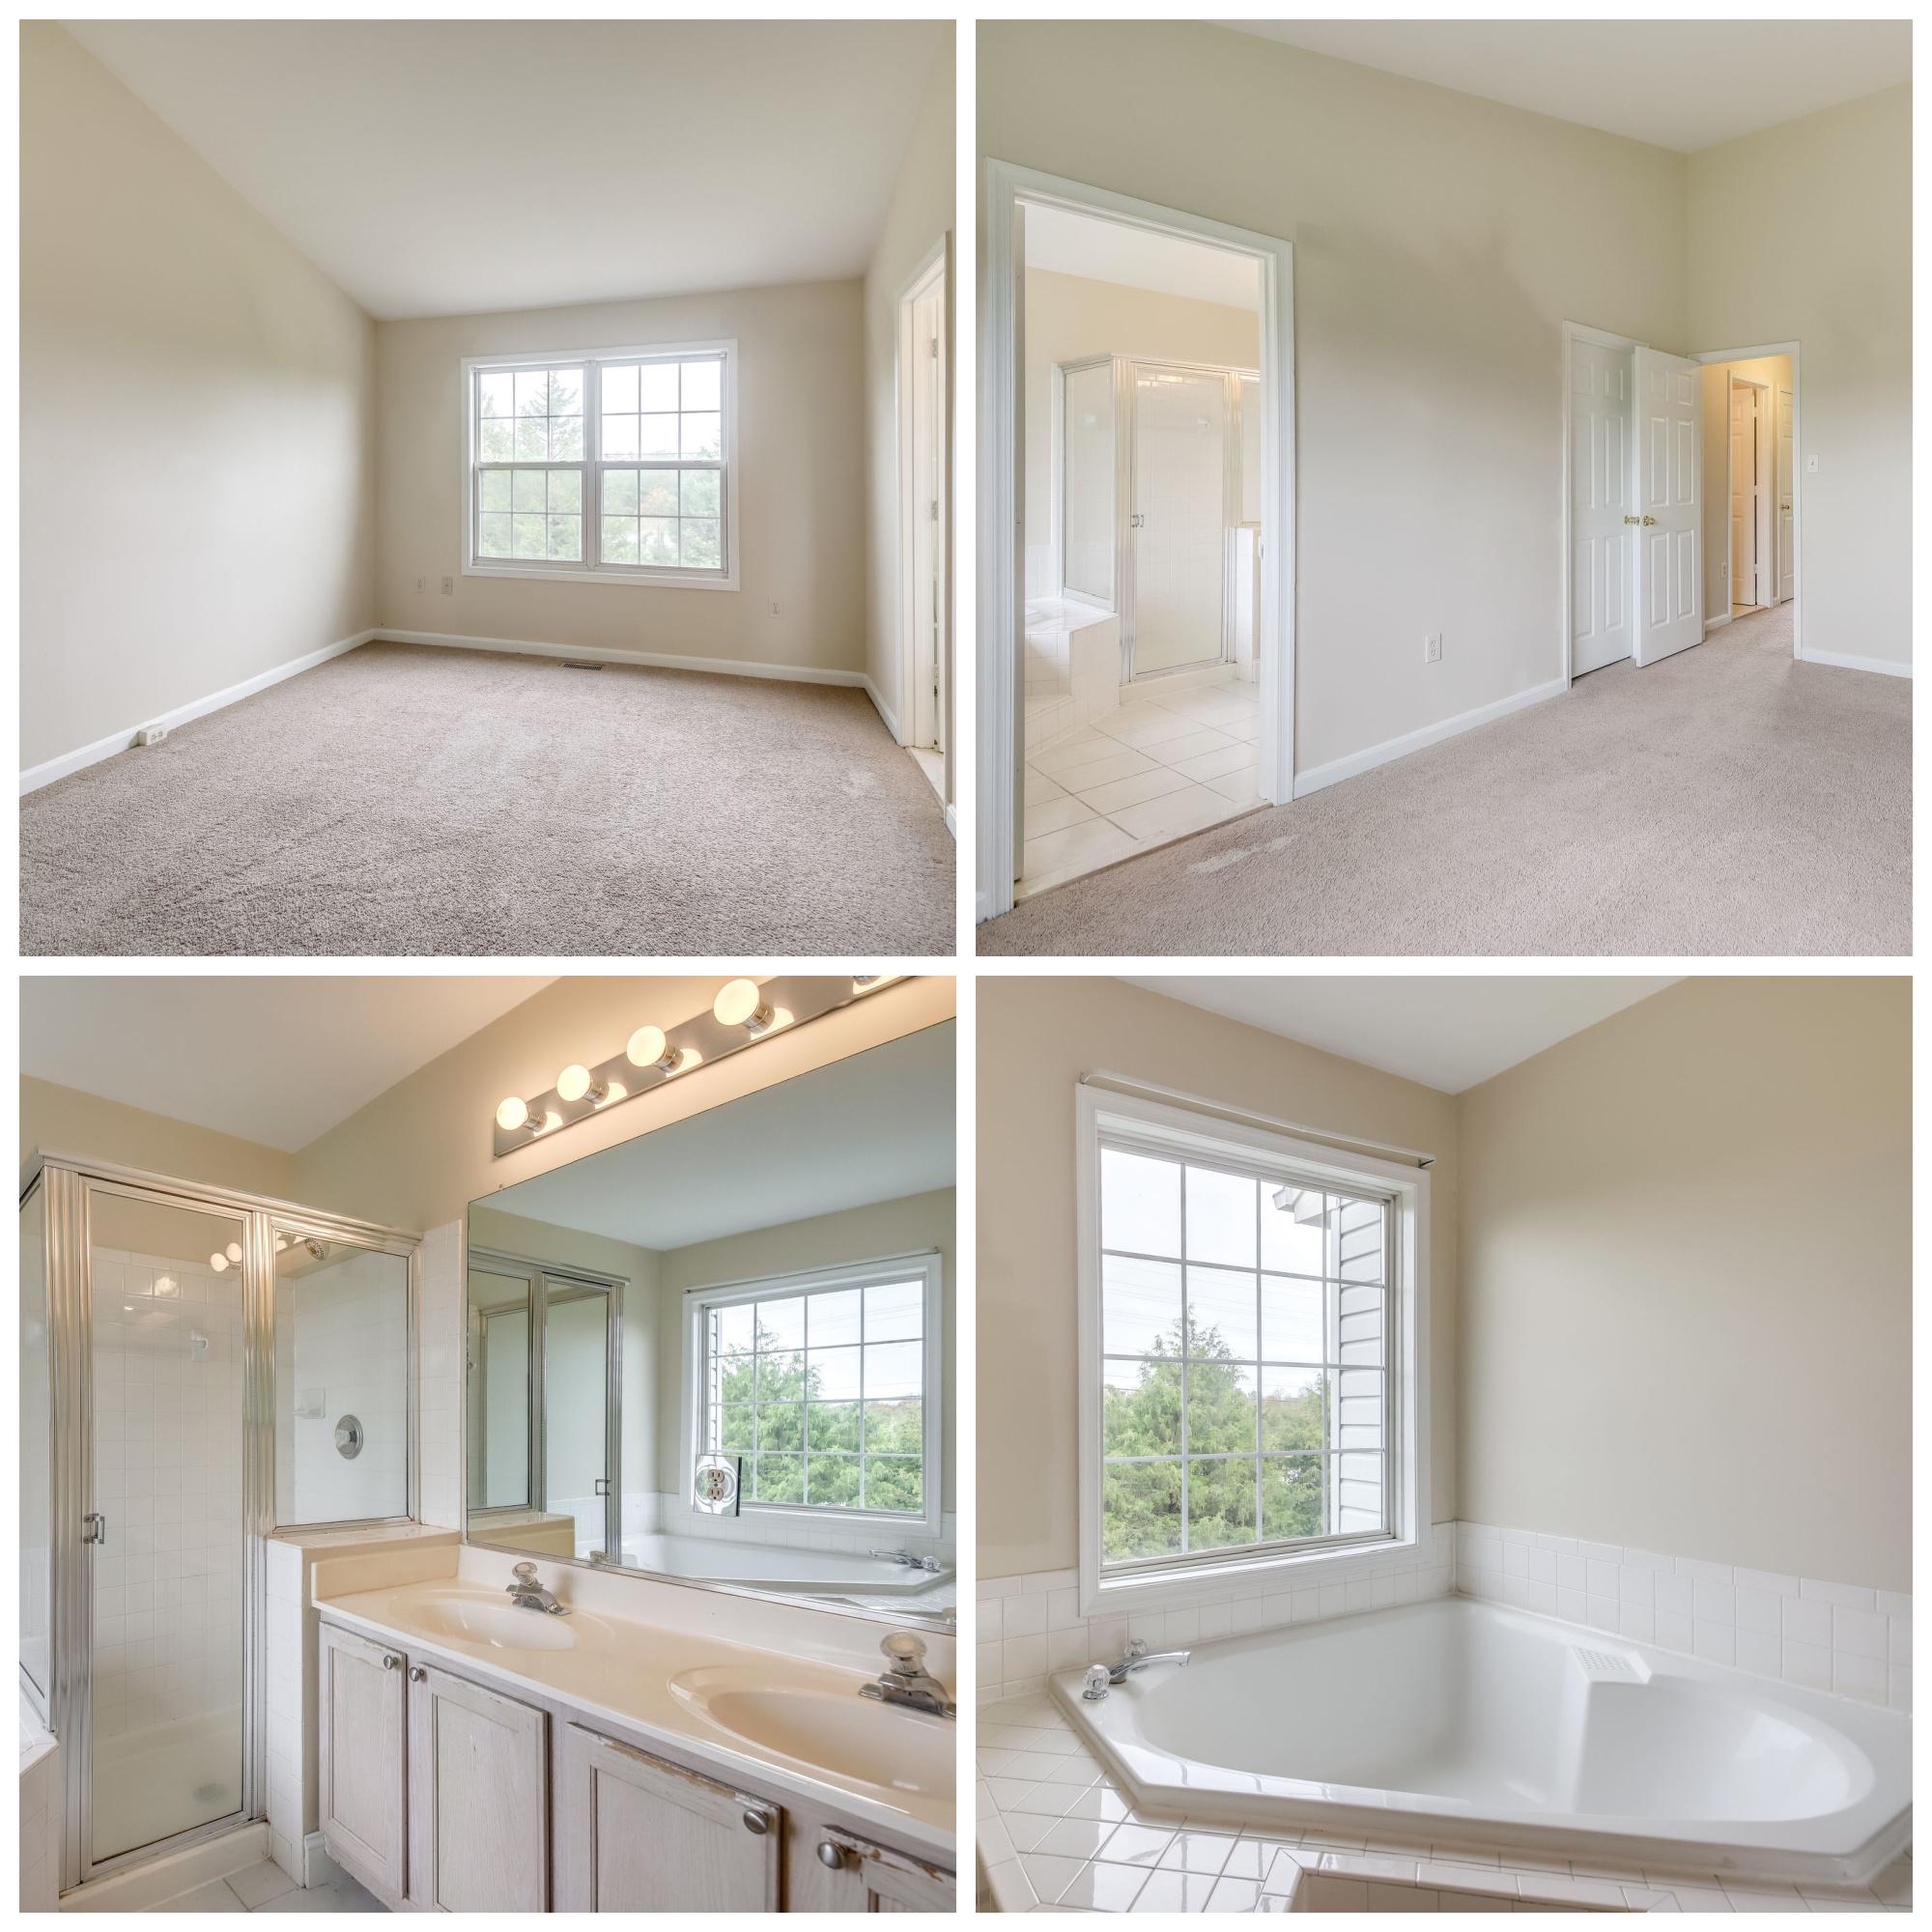 8404 Tackhouse Loop, Gainesville- Primary Suite